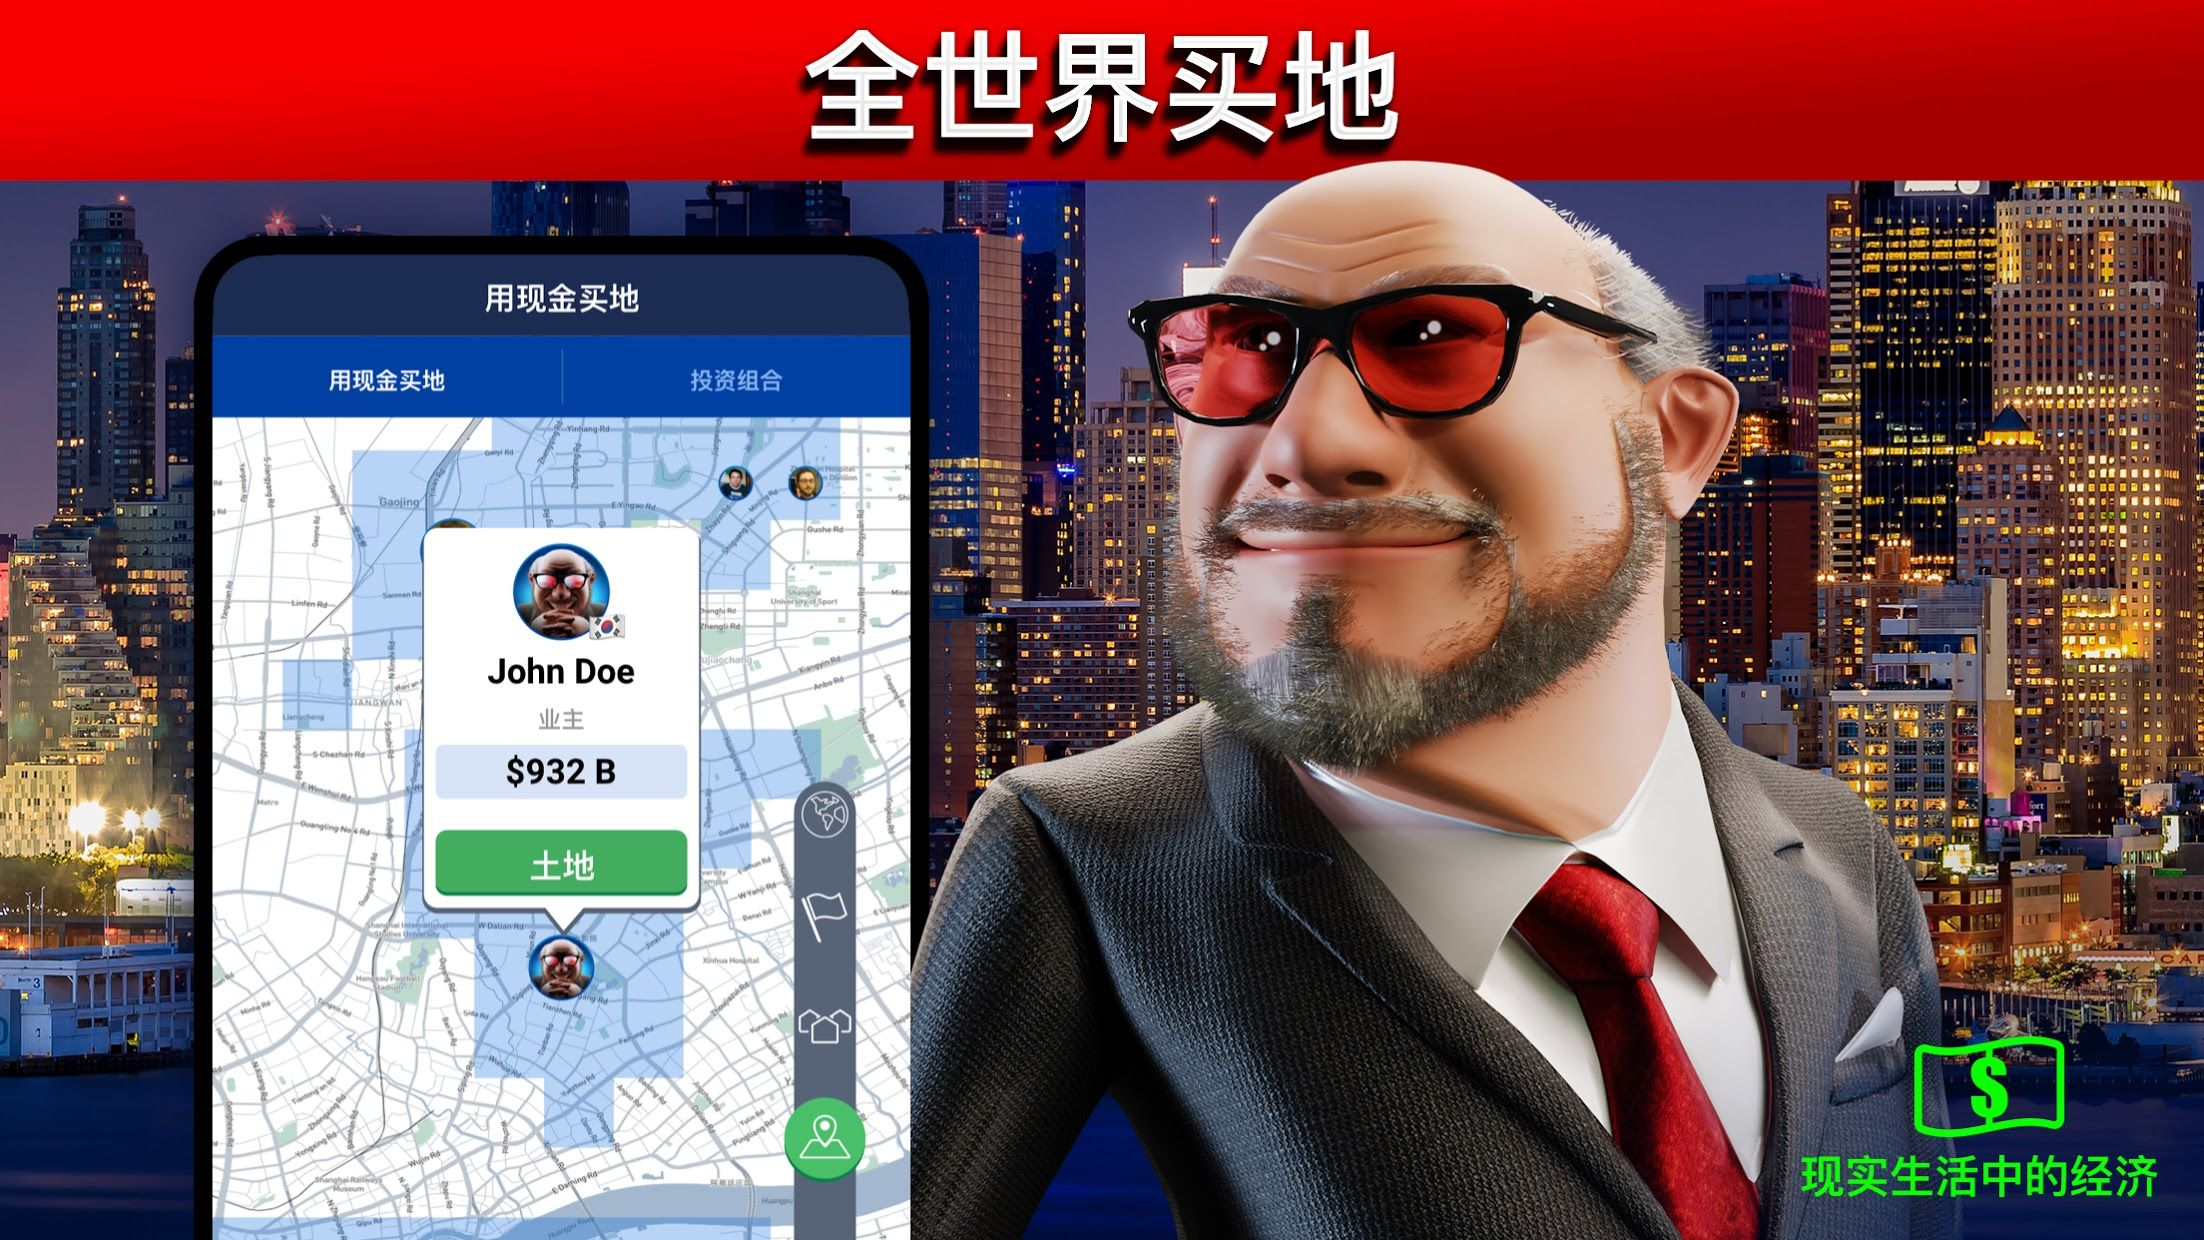 Landlord Tycoon - 探索真实世界城市房地产投资交易模拟经营游戏成为地产富豪 游戏截图3